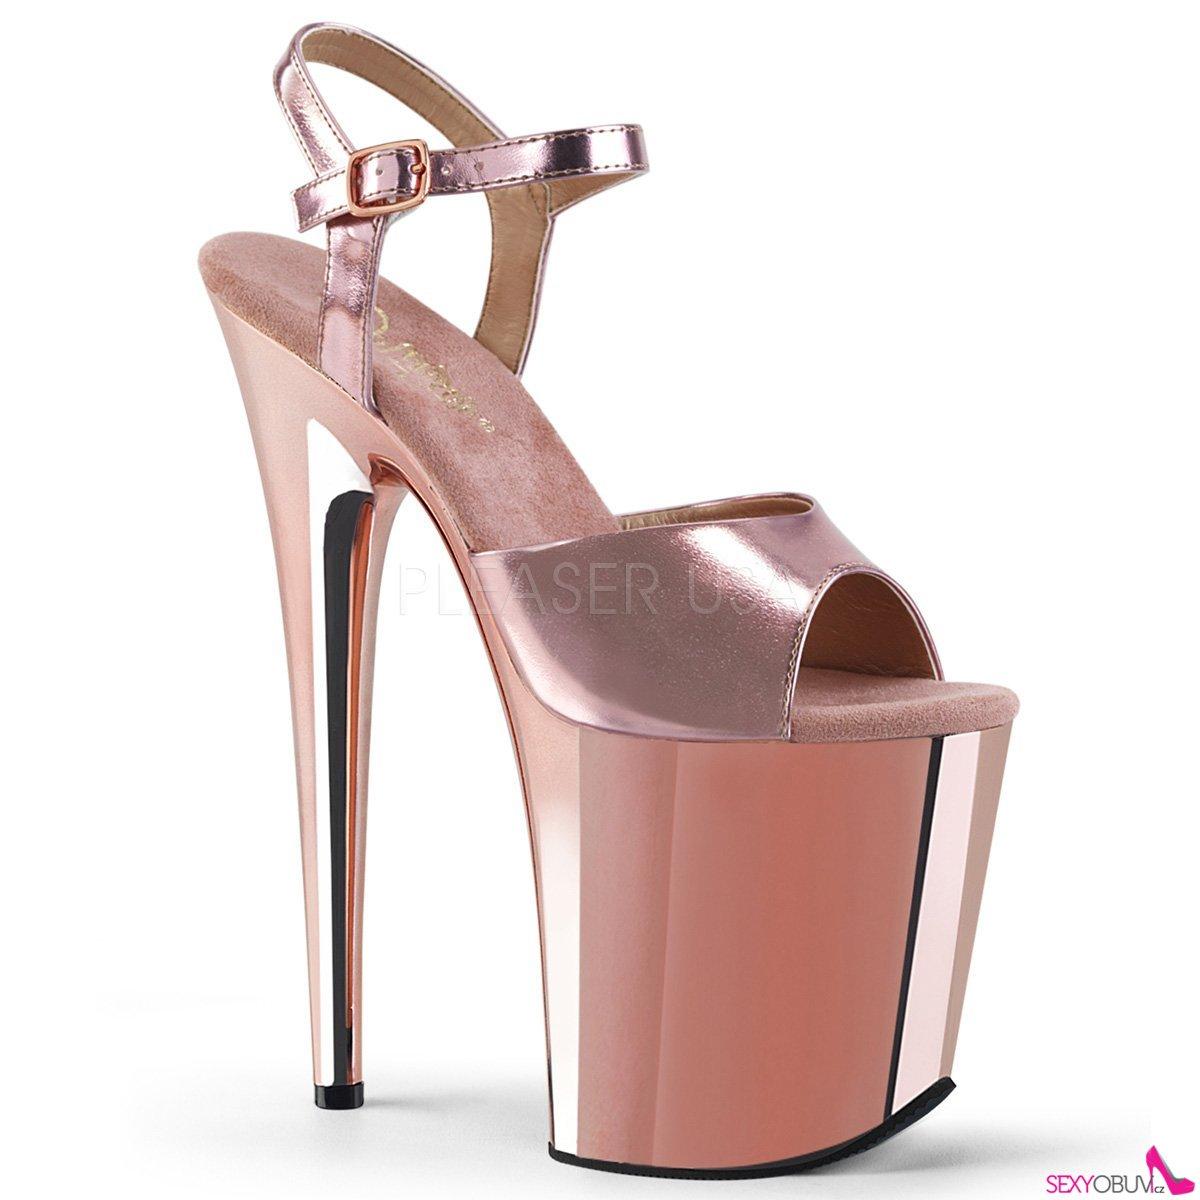 d1a12ce283b9 FLAMINGO-809 Extra vysoké sandály flam809 rogldpu m růžové zlato ...